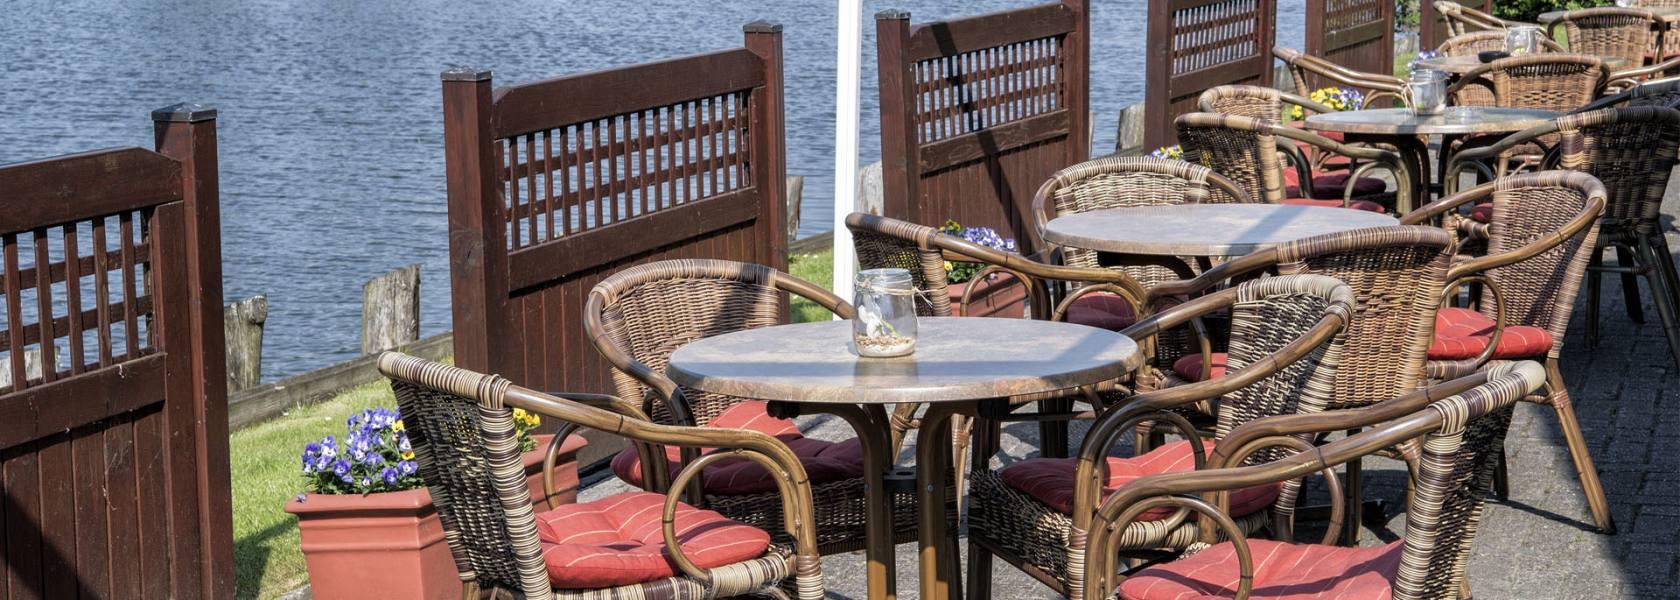 Cafe am Hafen, © Florian Trykowski